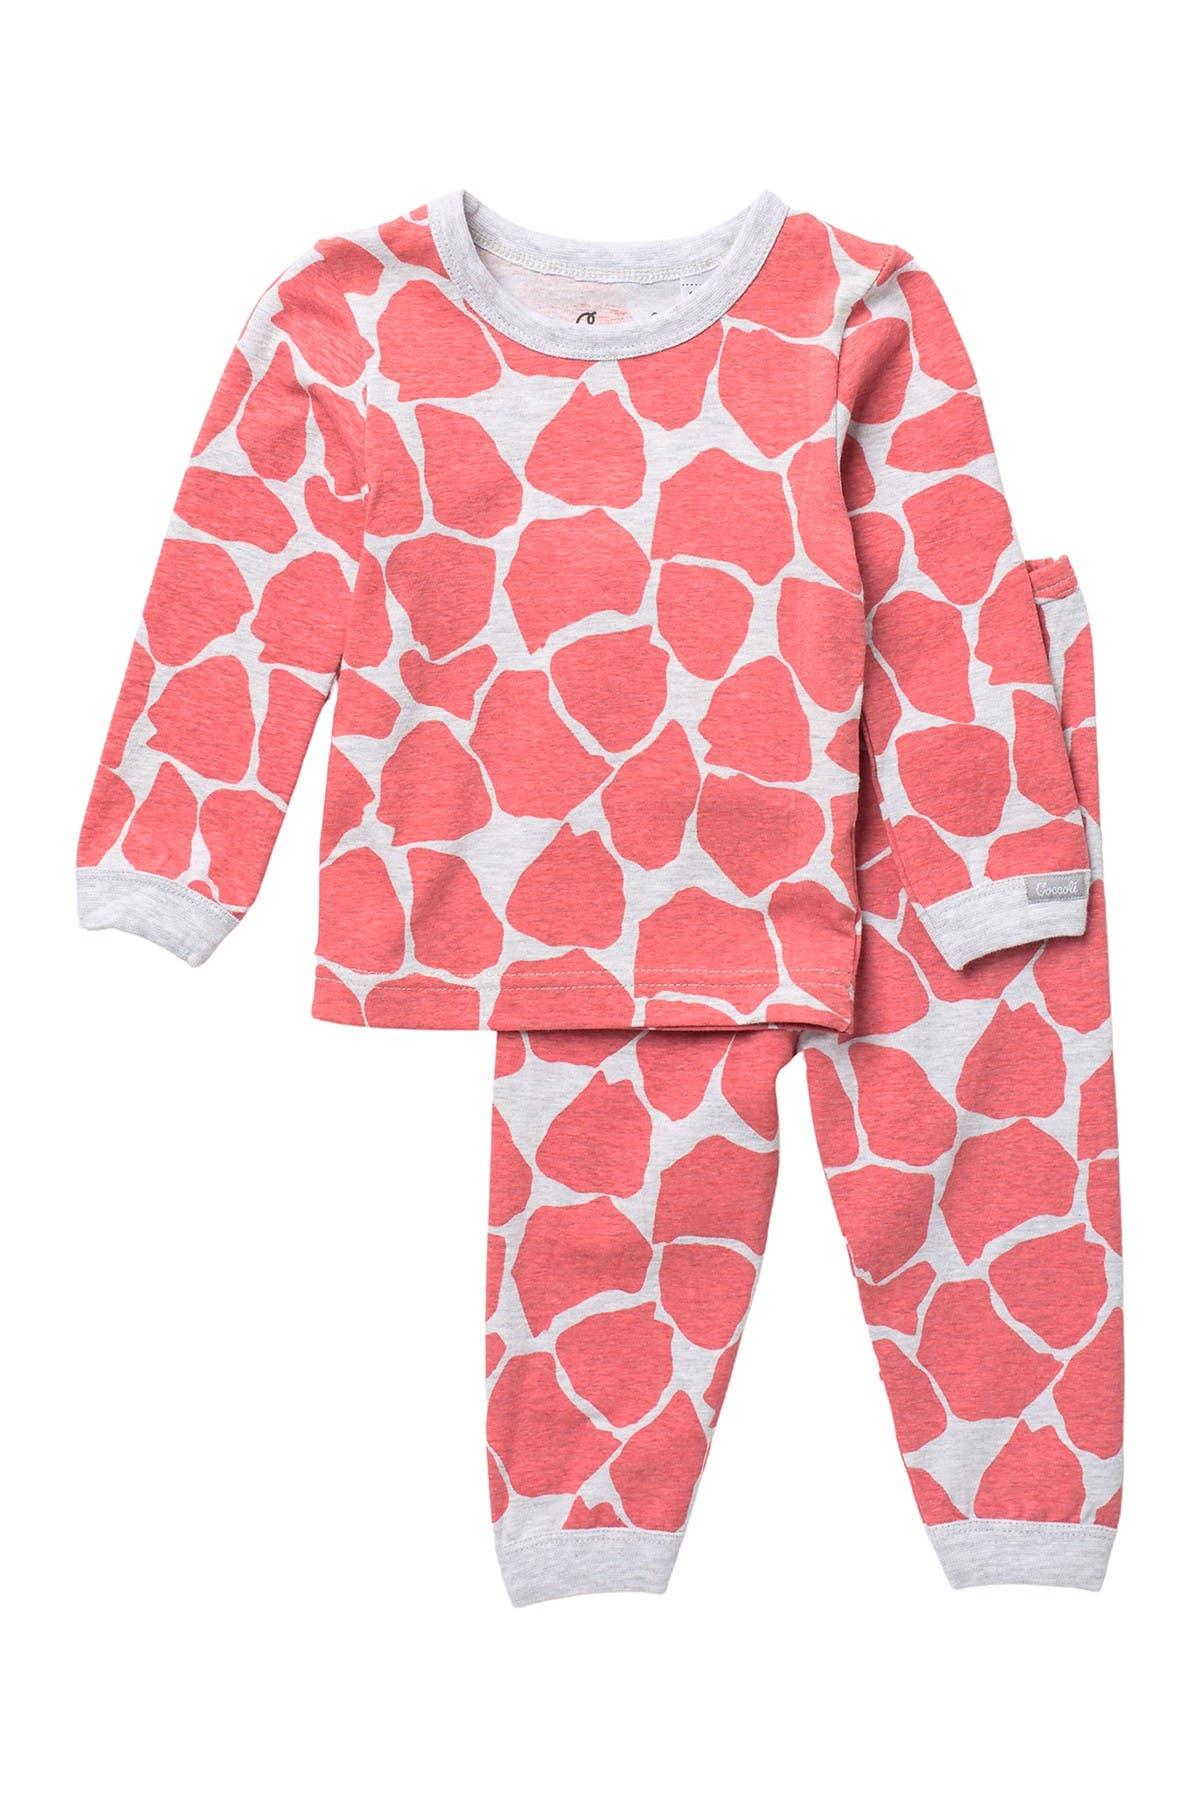 Coccoli Spot Print Top & Pants Pajama Set